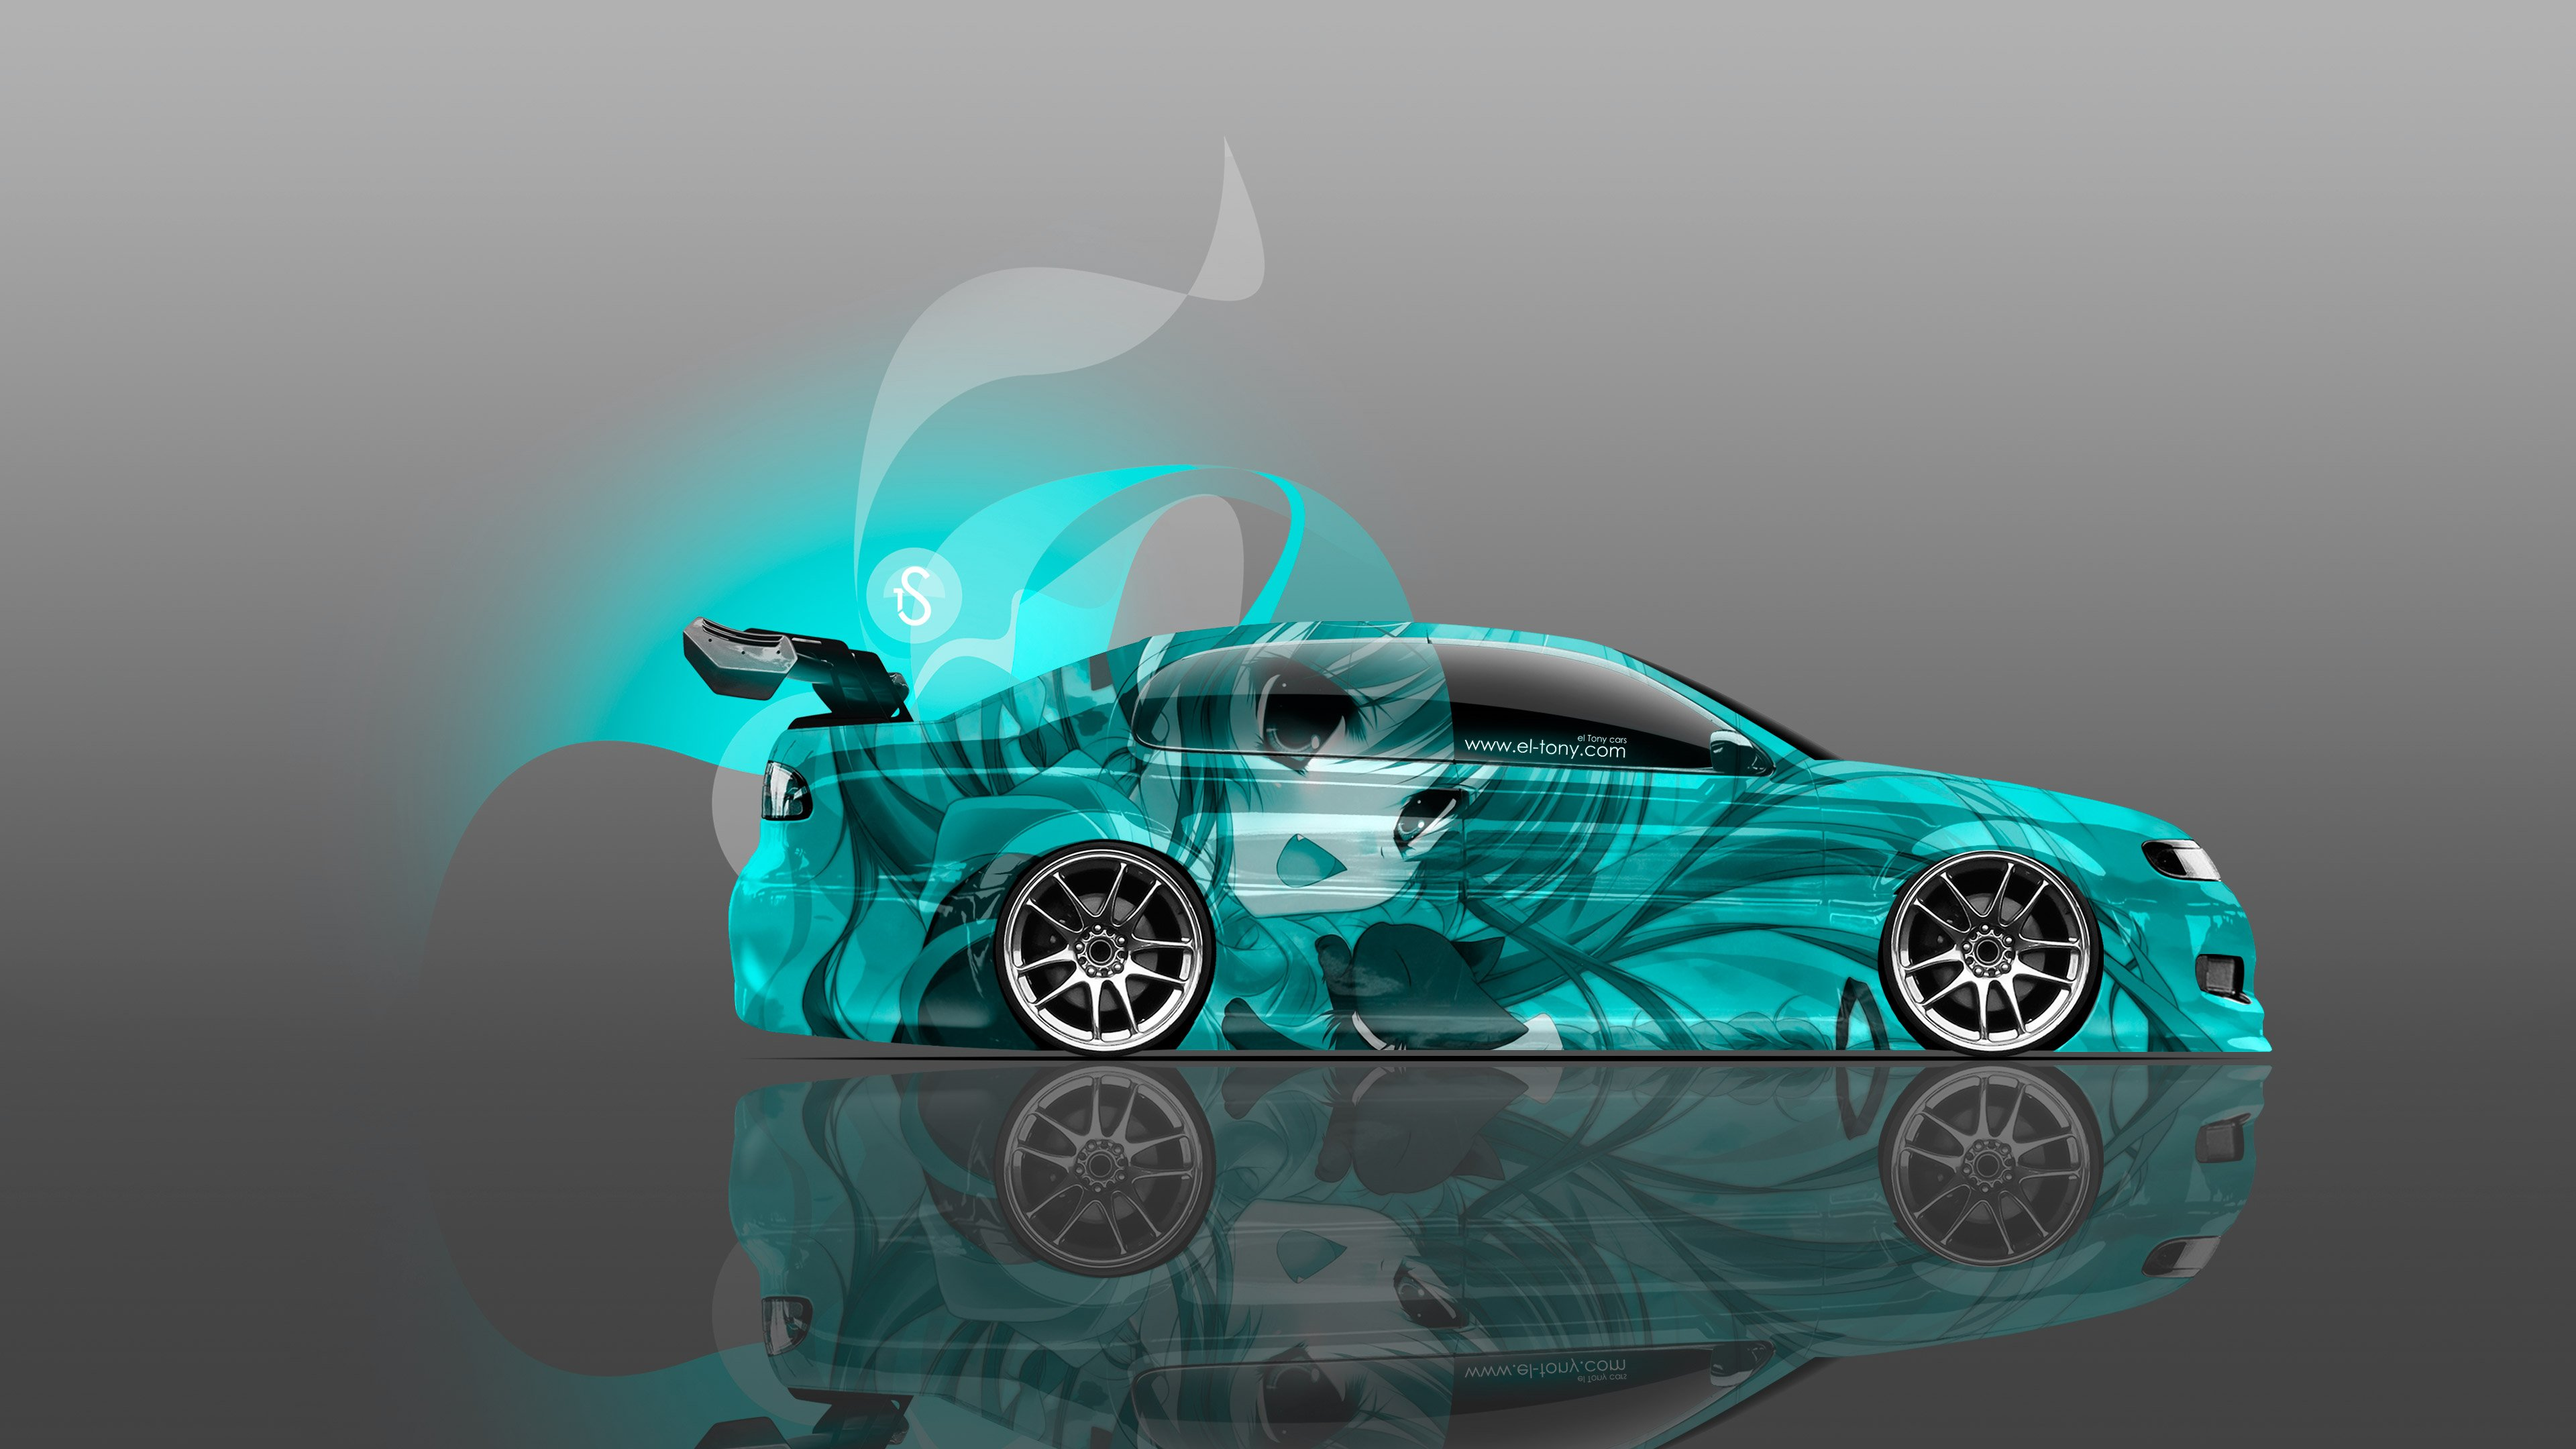 JDM Tuning Side Anime Girl Aerography Car 2014 Azure Neon Effects 4K  3840x2160